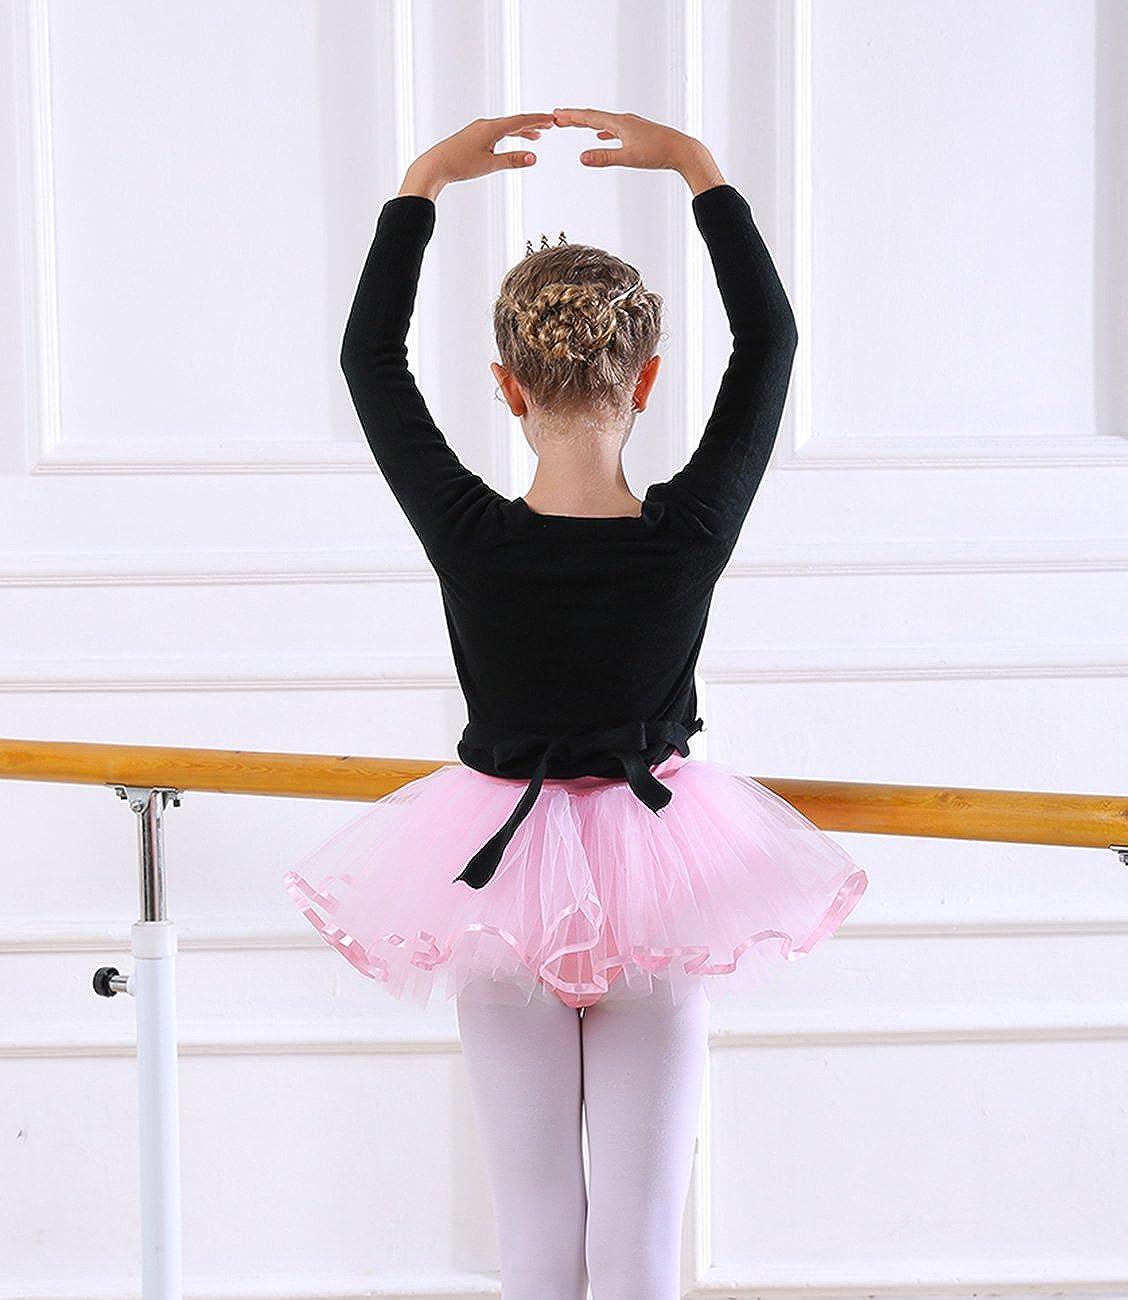 ae542deb6 Amazon.com: PINKDAA Kids Girl Dance Sweater Ballerina Long Sleeve Knit Wrap  Top Ballet Cardigan: Clothing